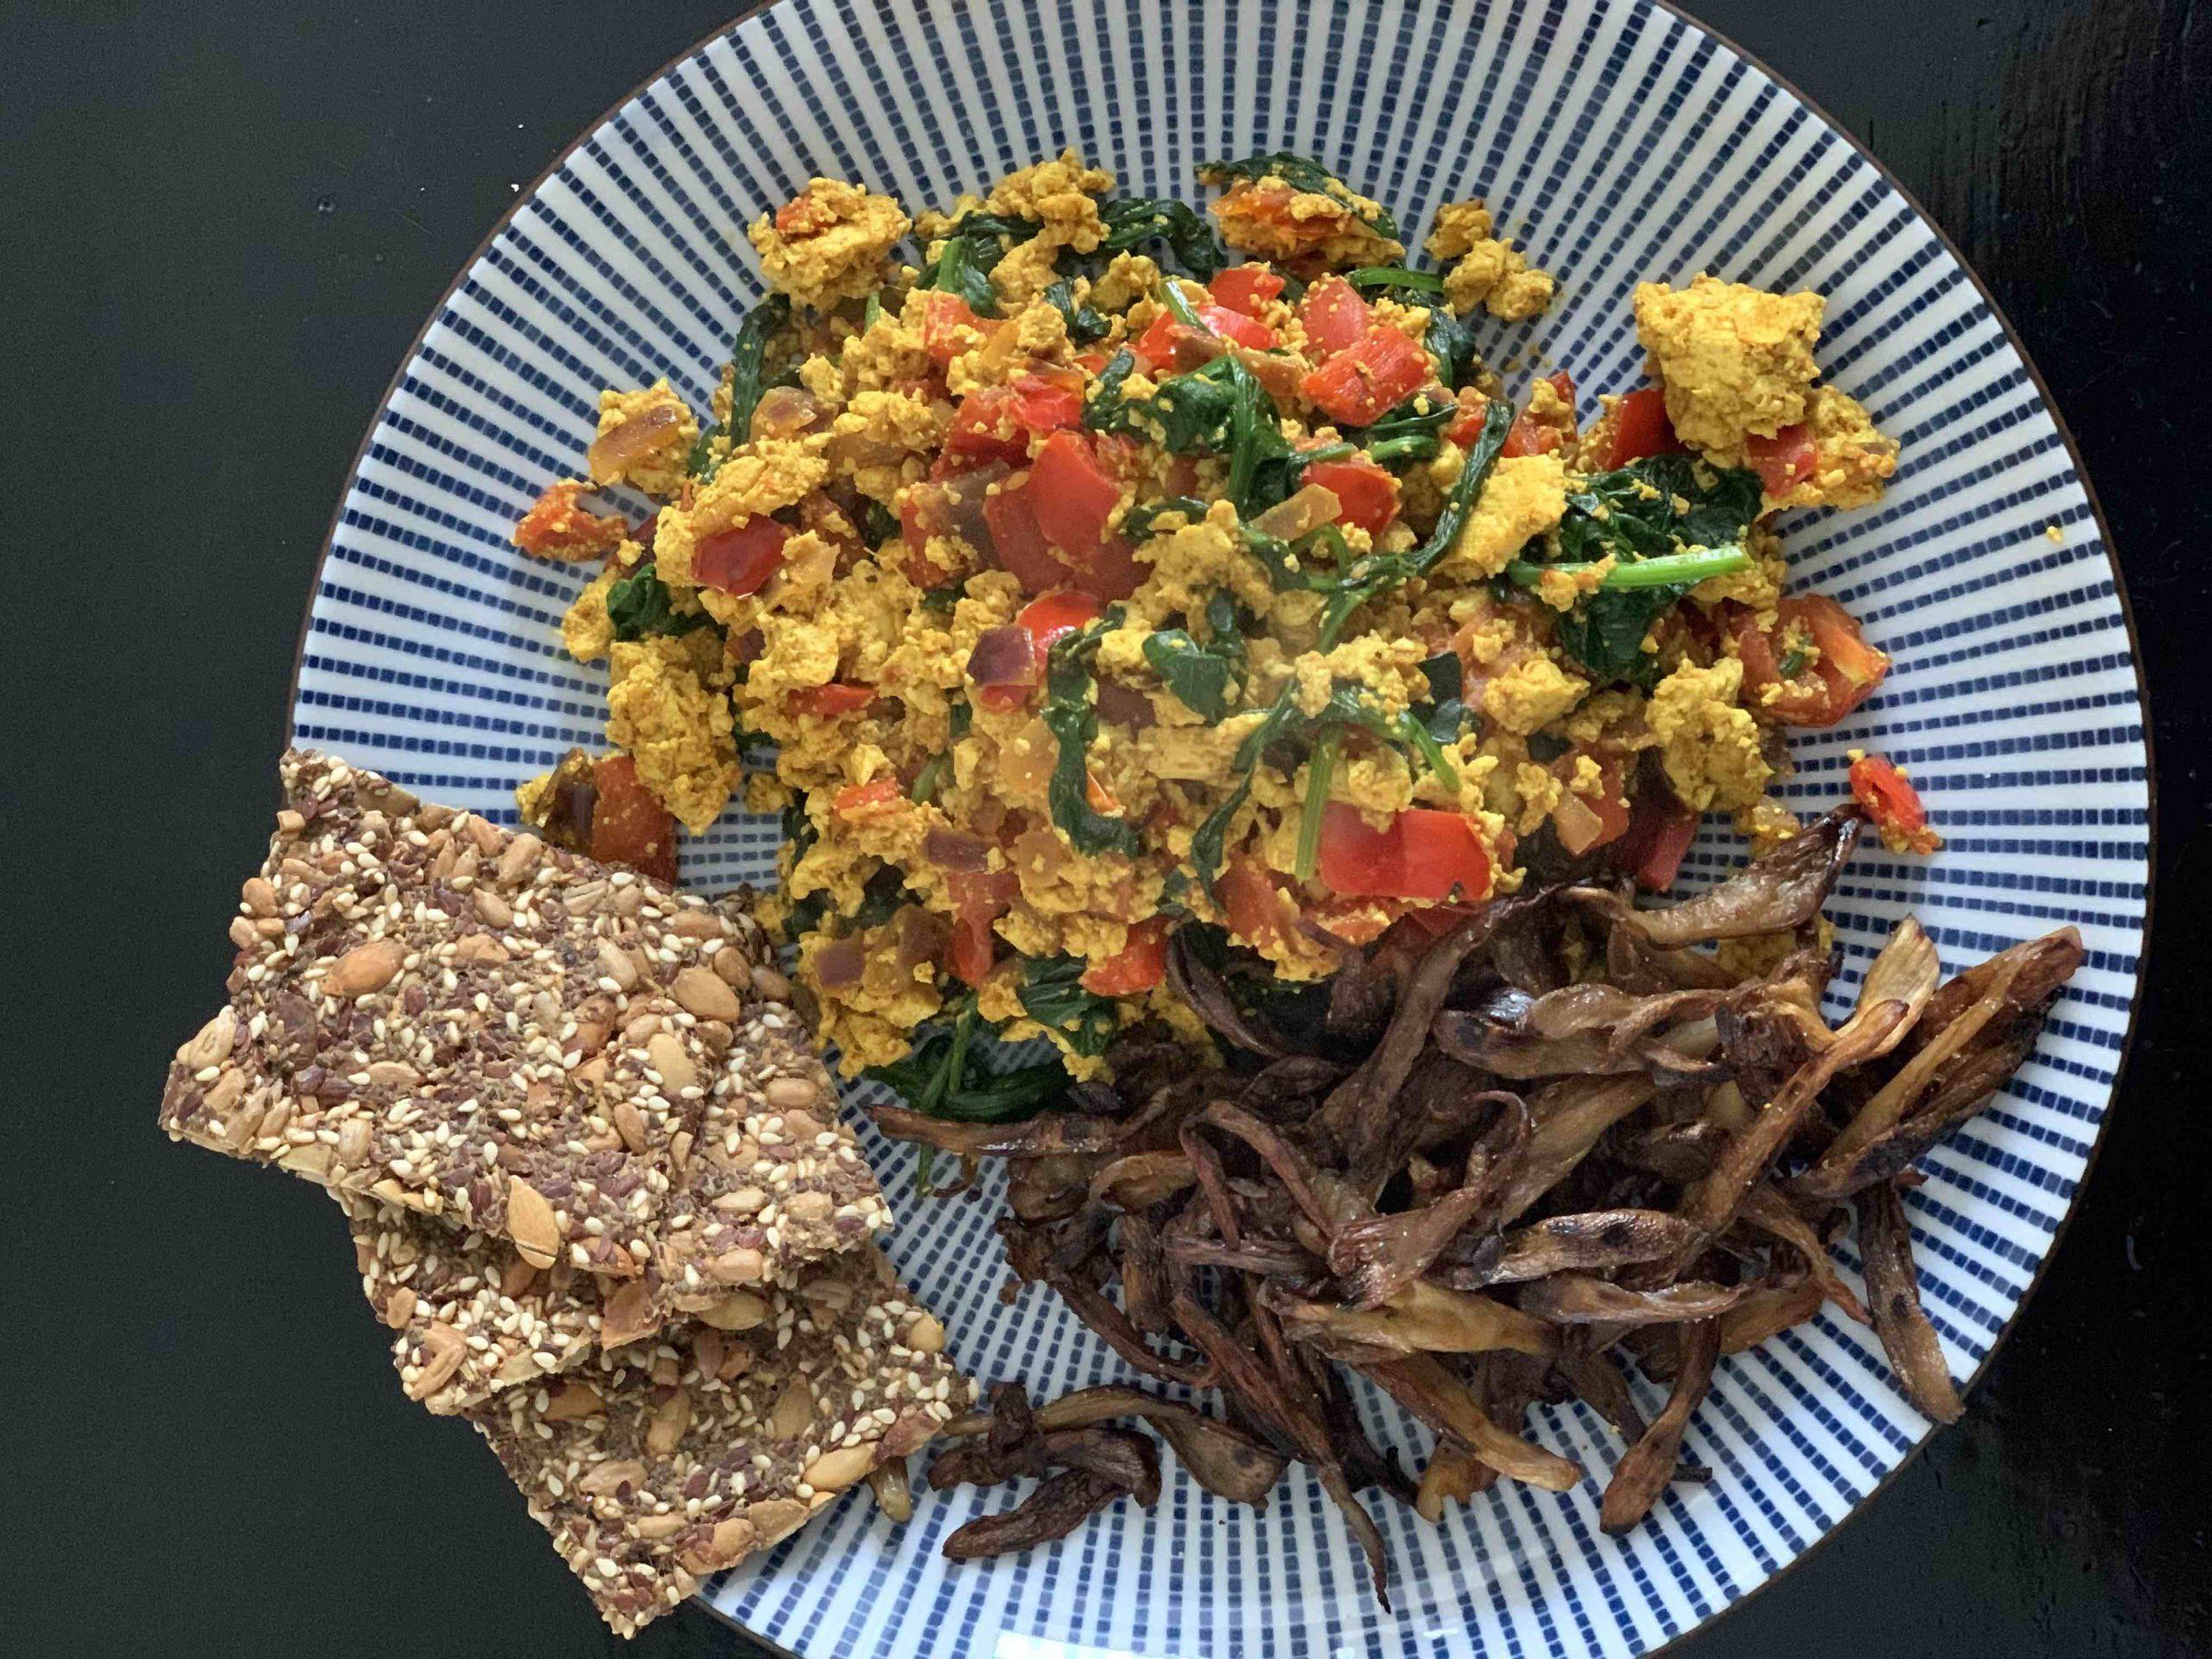 vegan ontbijt b&b valkenbos tofu scramble